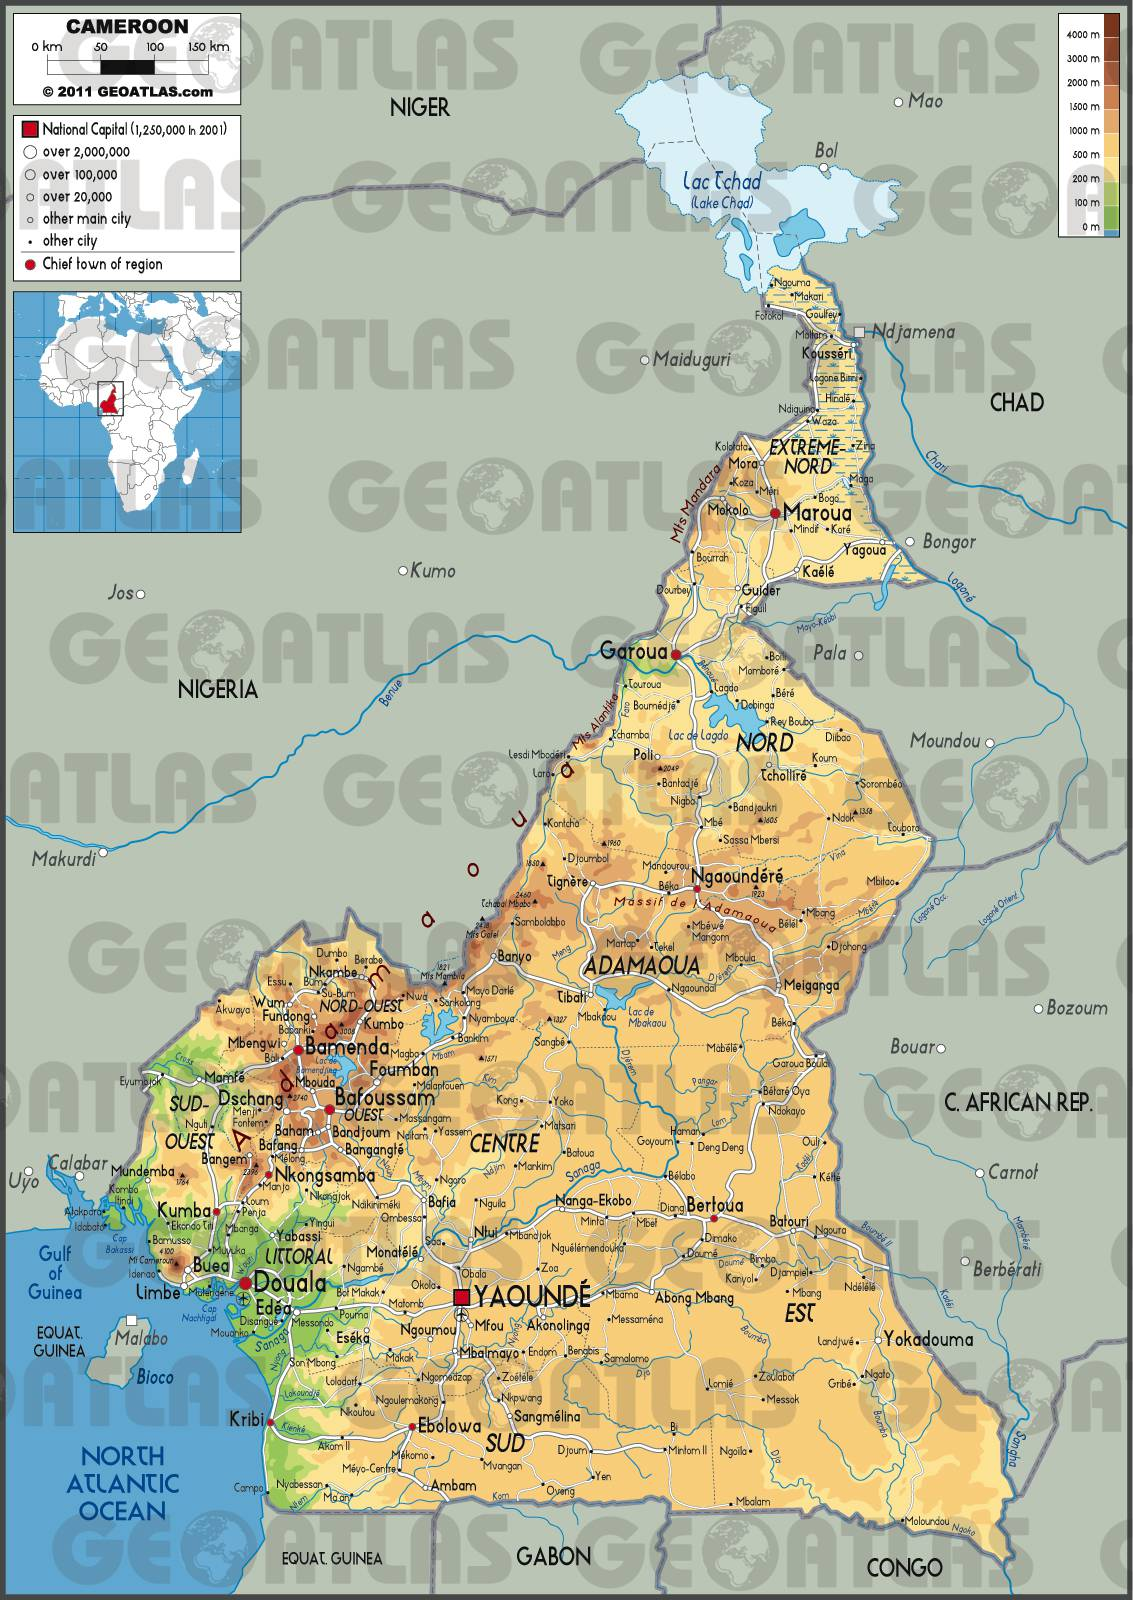 Carte géographique du Cameroun